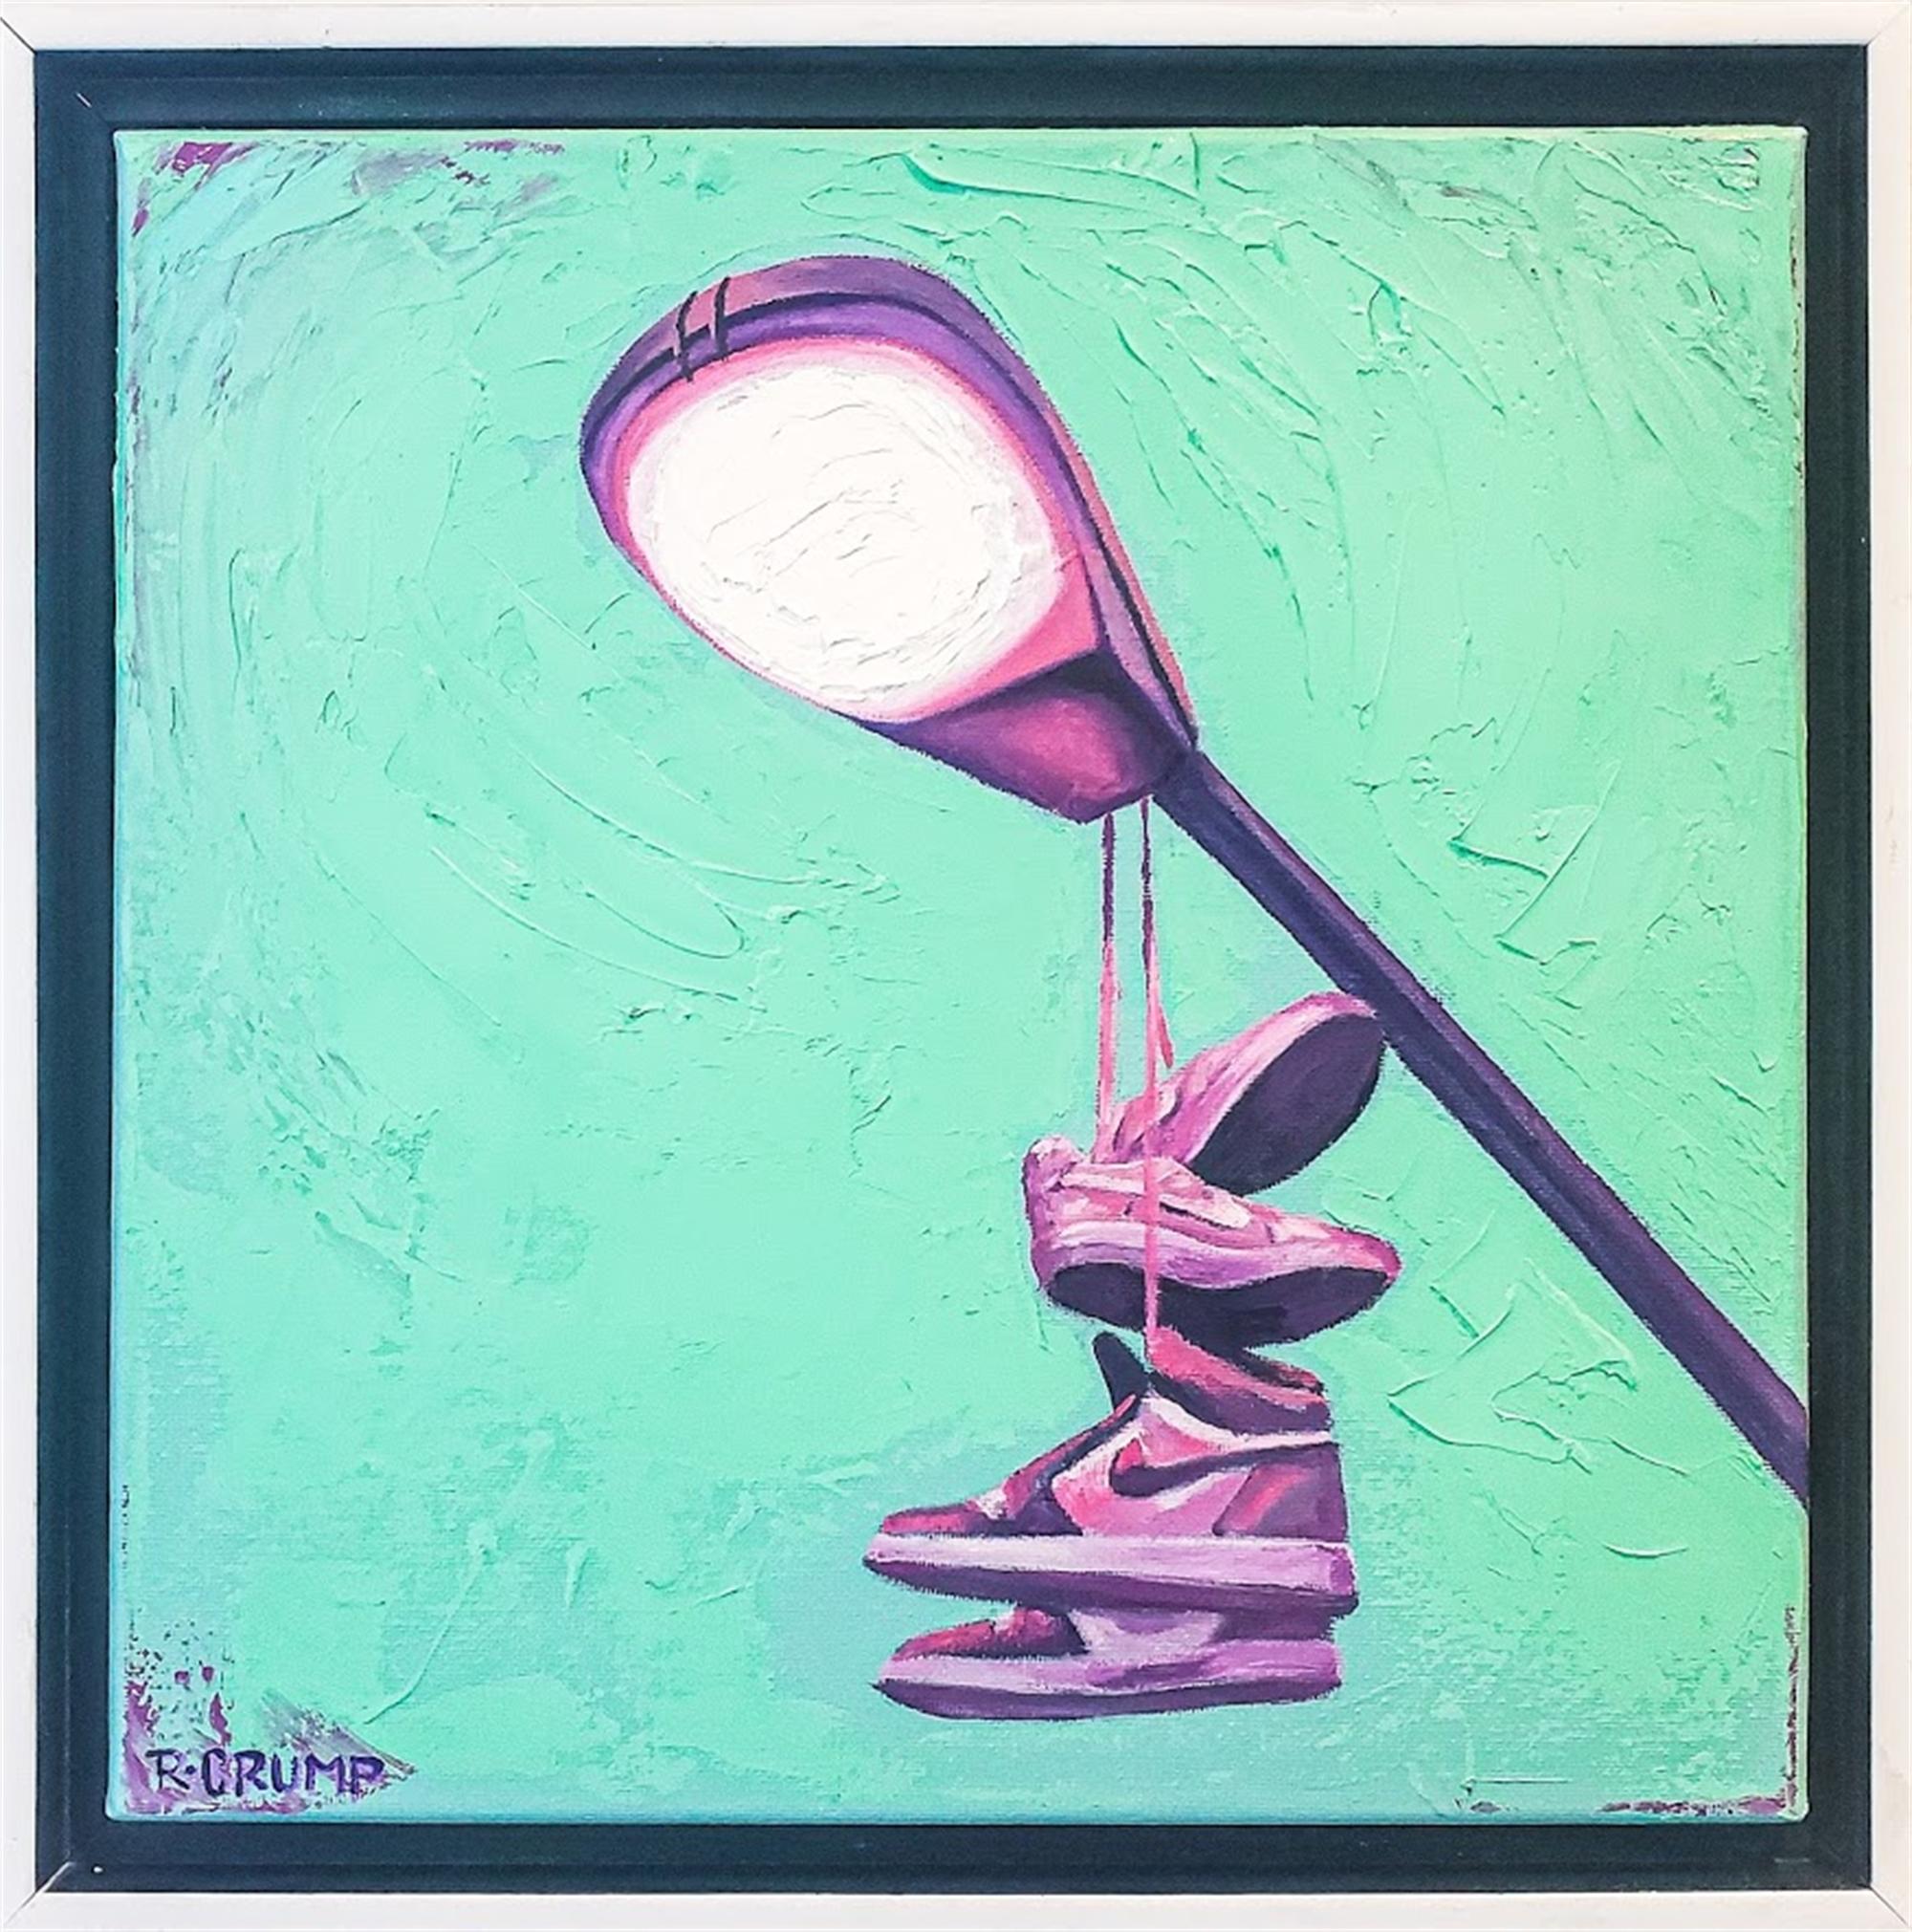 Illuminate I by Rapheal Crump